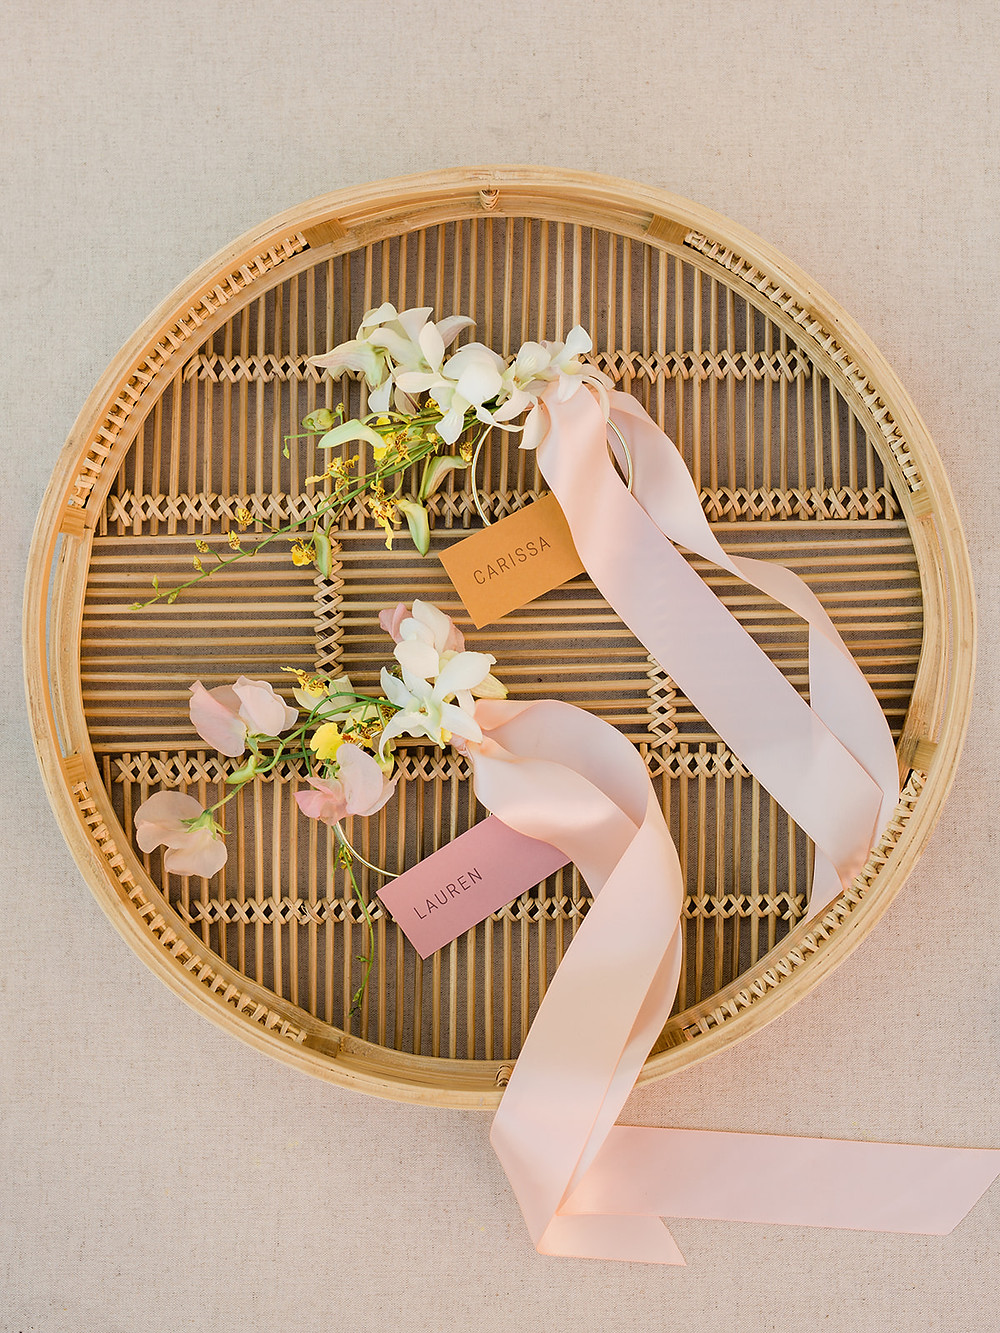 corsages gold cuffs - Modern Moroccan Desert Glam Editorial - LGBTQ Wedding Editoiral - Wedding Design Inspiration - Muted Desert Tones - Modern Glam Jungle Chic